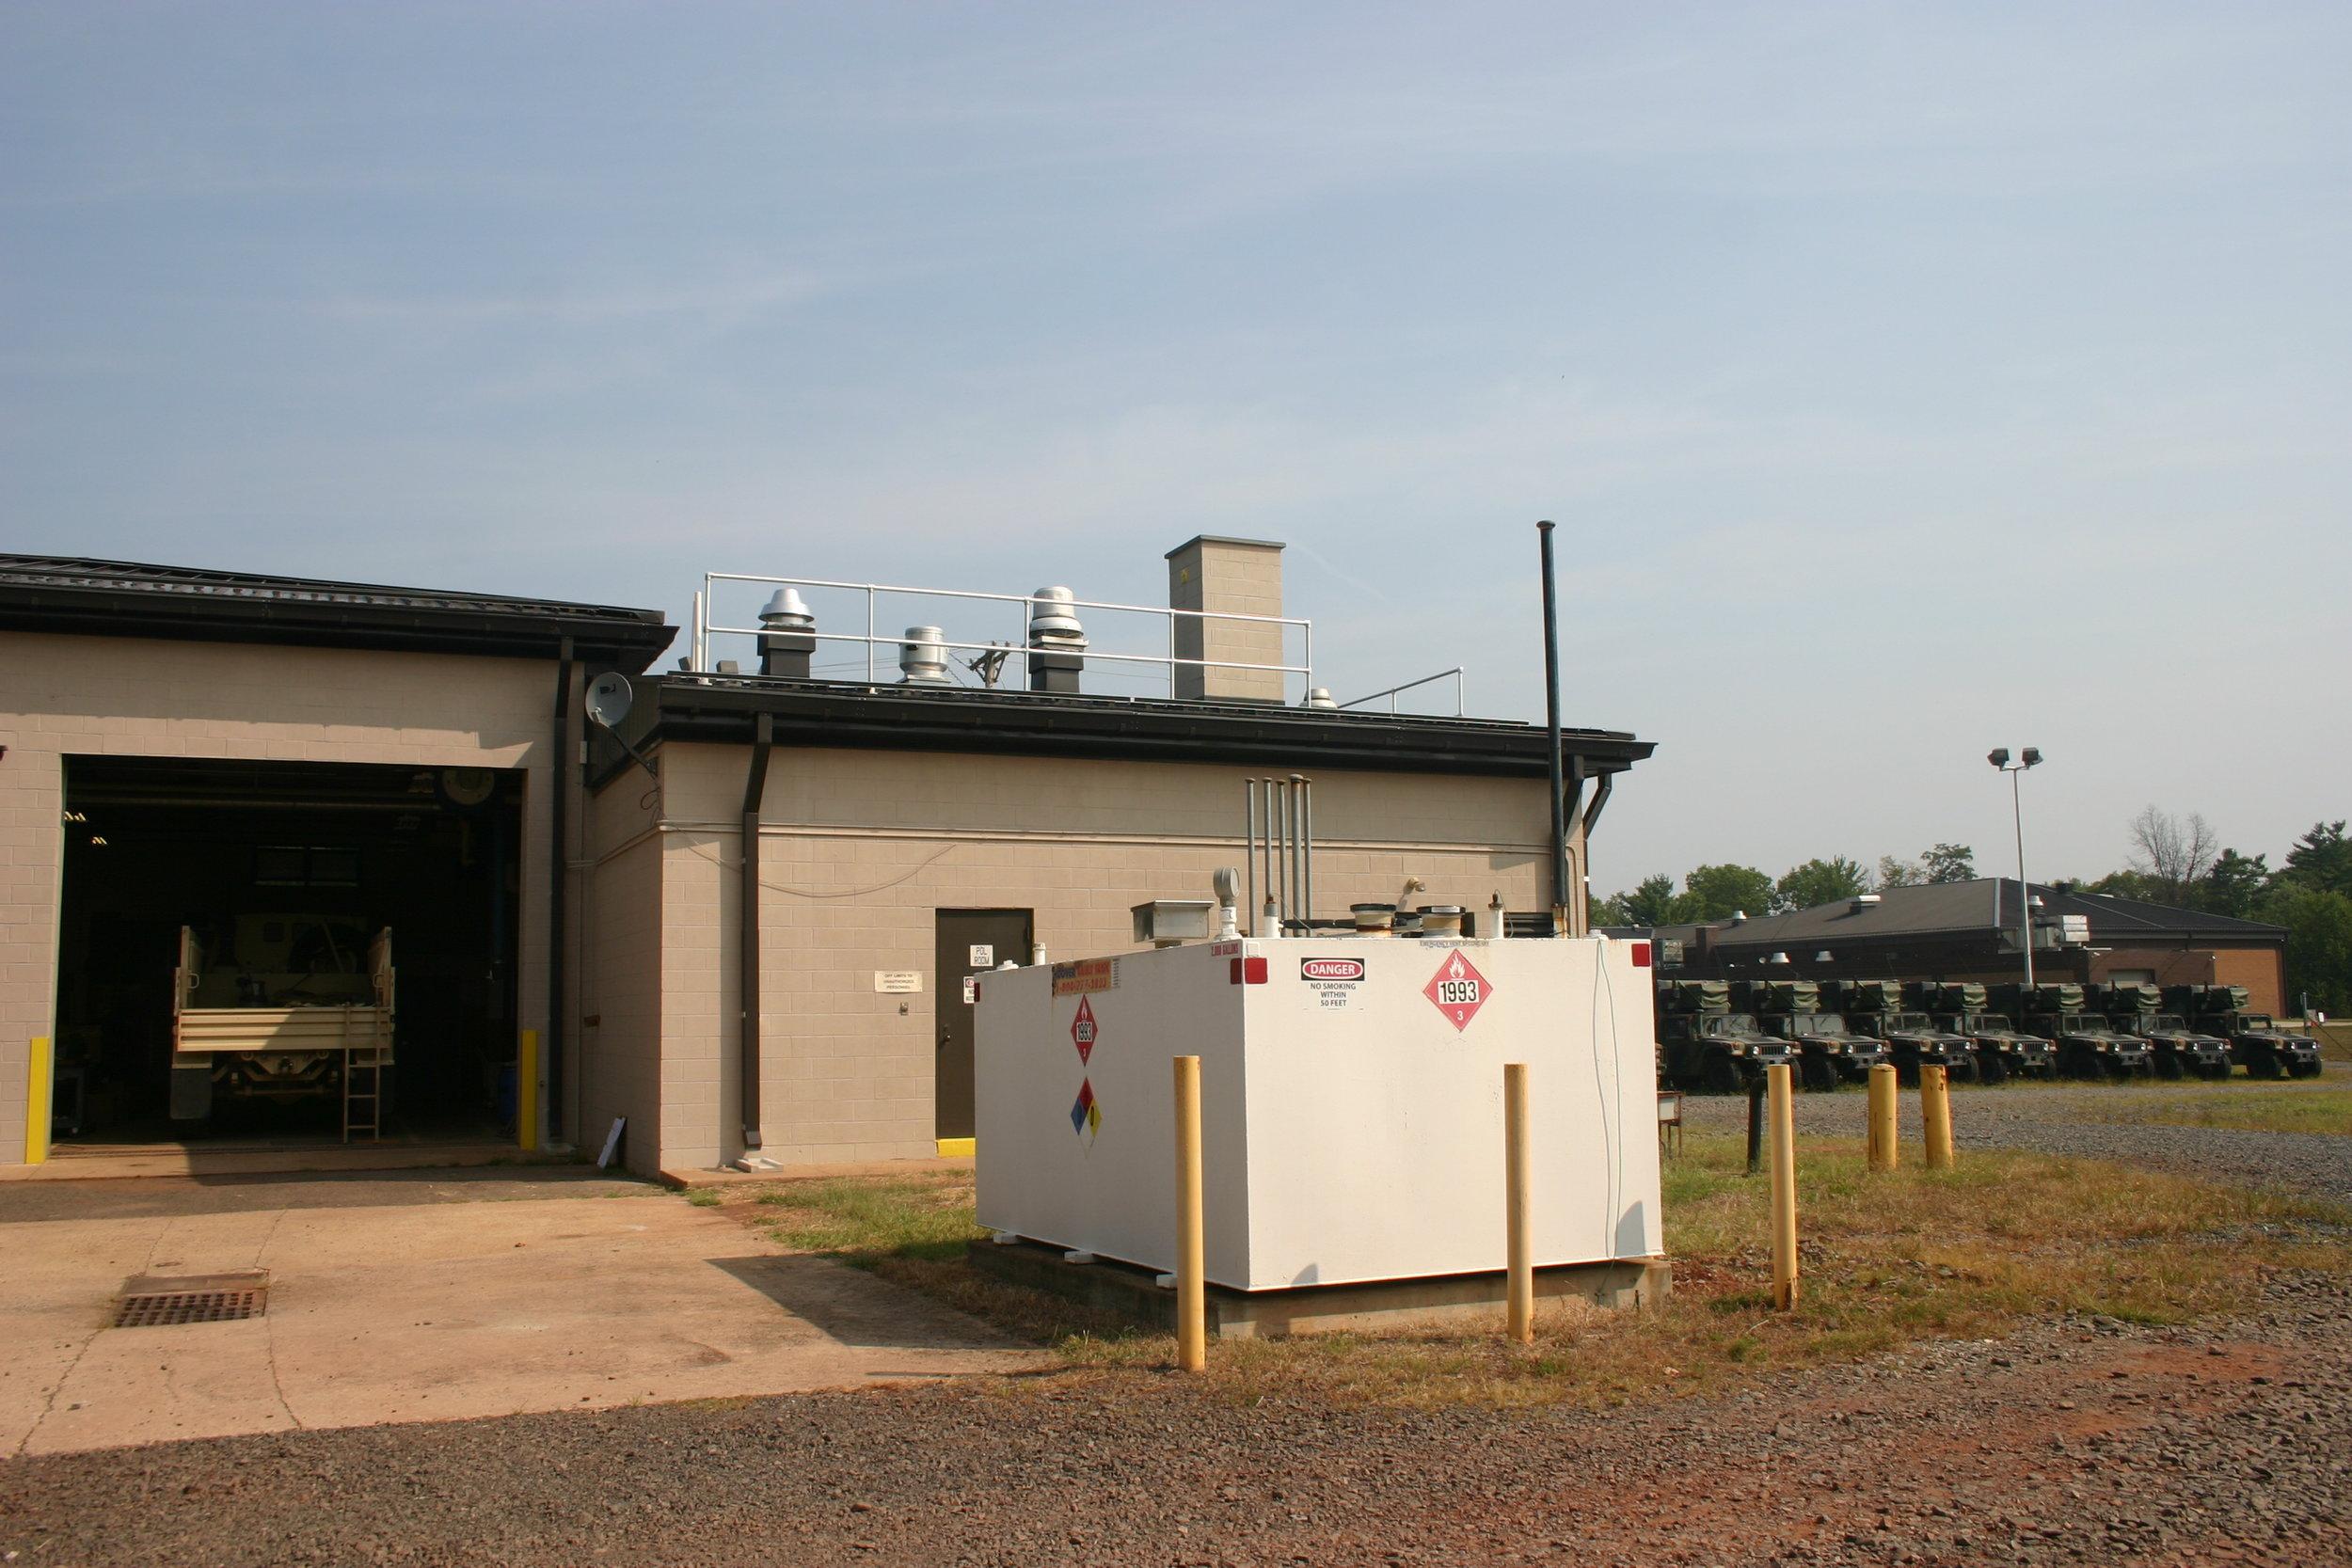 Crane-Associates-NJ-Architectural-Mechanical-Engineering-Firm-NJ-DMAVA-National-guard-fuel-tank.jpg